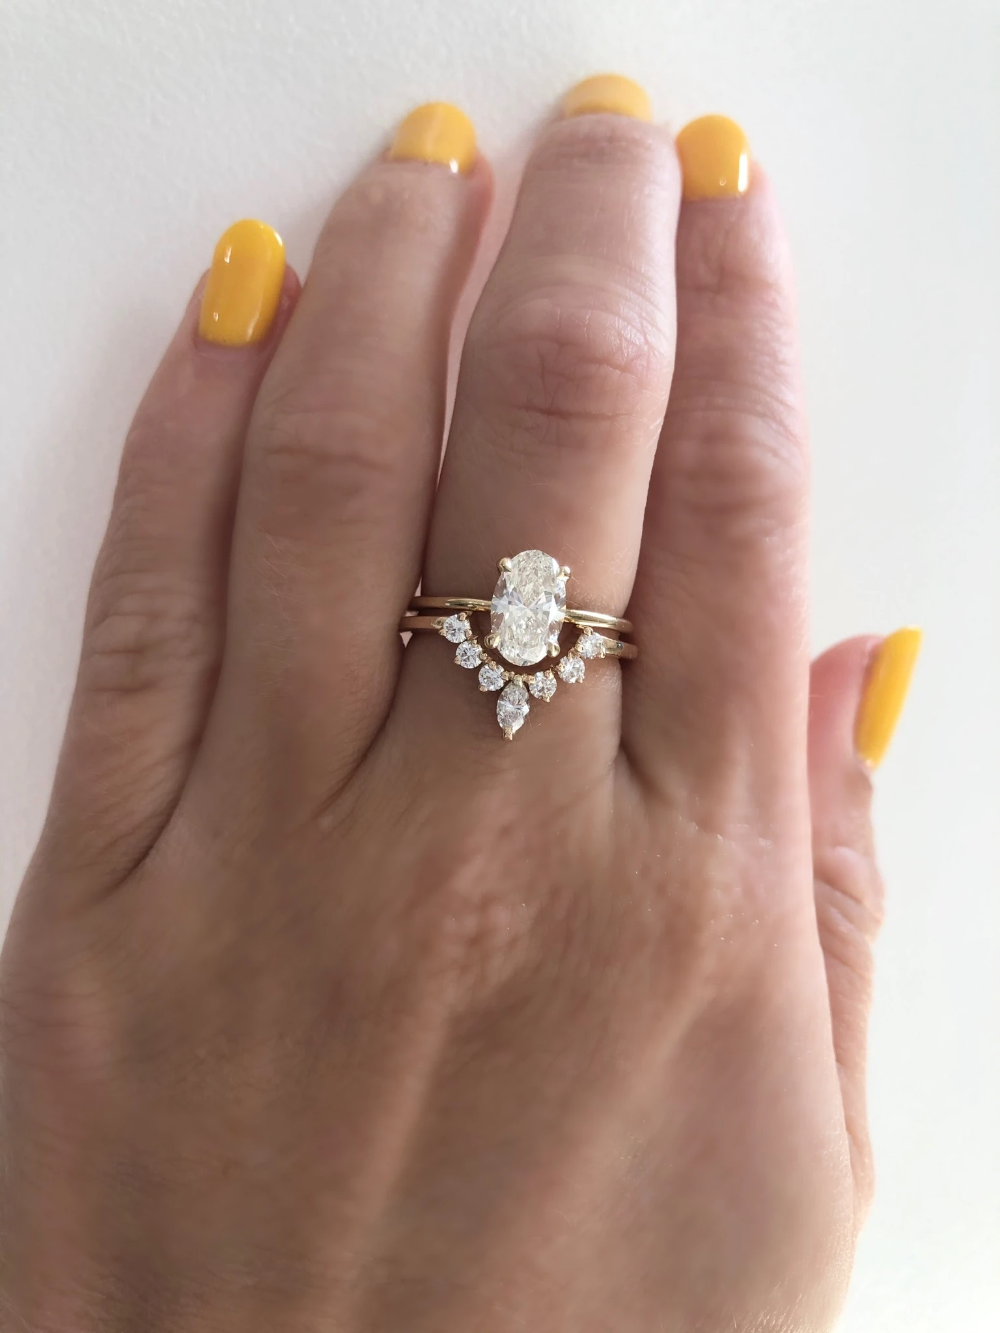 Ulla Band In 2021 Wedding Rings Oval Boho Wedding Ring Wedding Ring Sets Unique